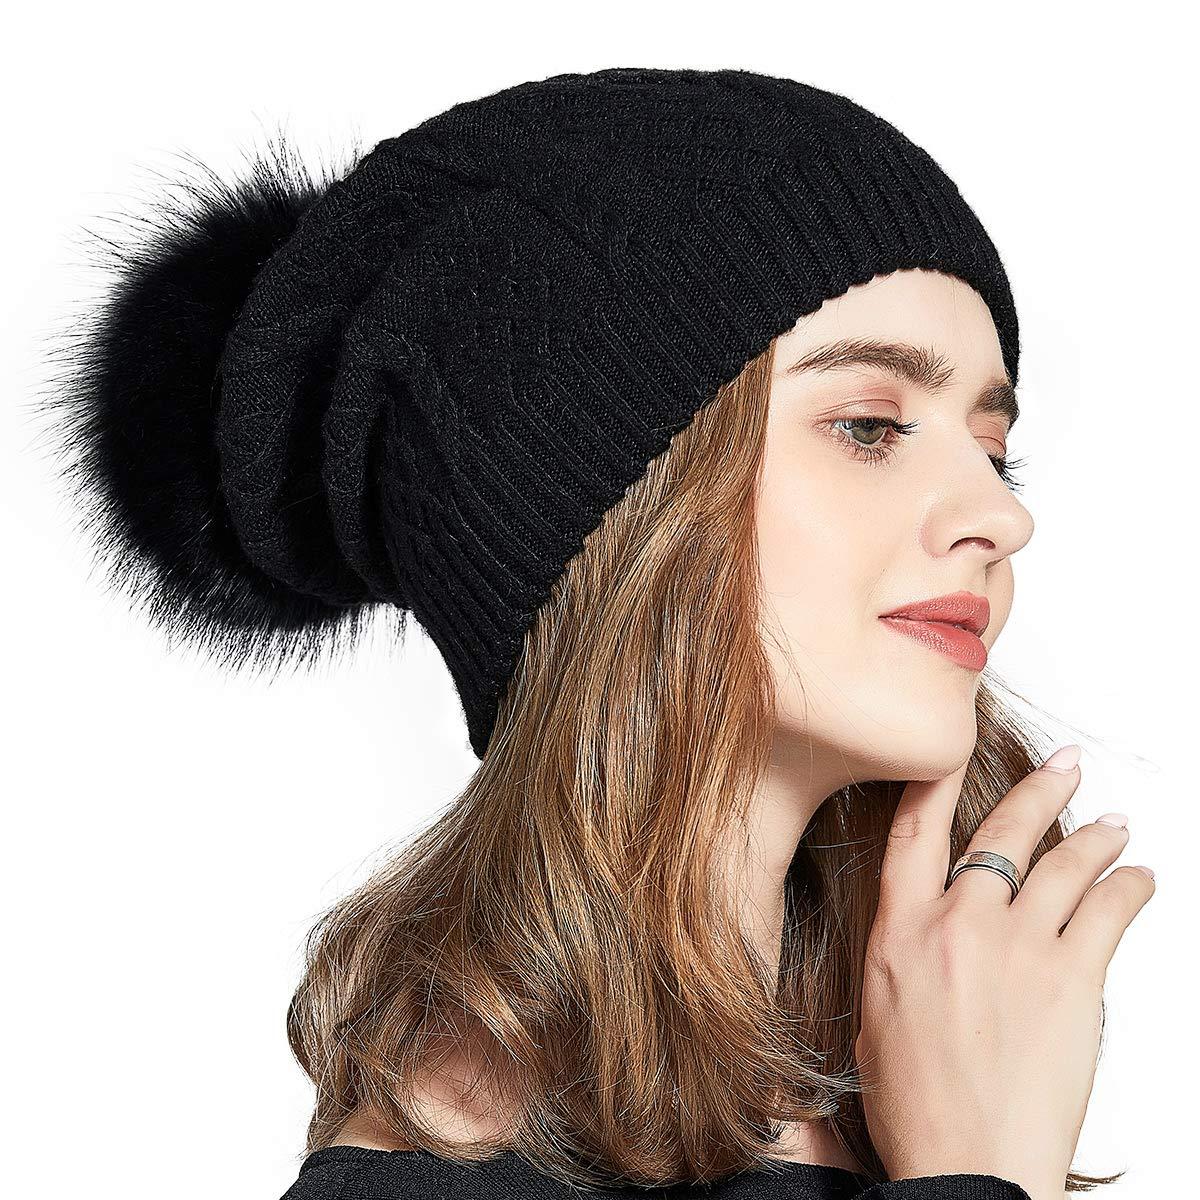 Winter Slouchy Beanie Real Fur Pompom Hats for Women Girls Knit Wool Ski Cap